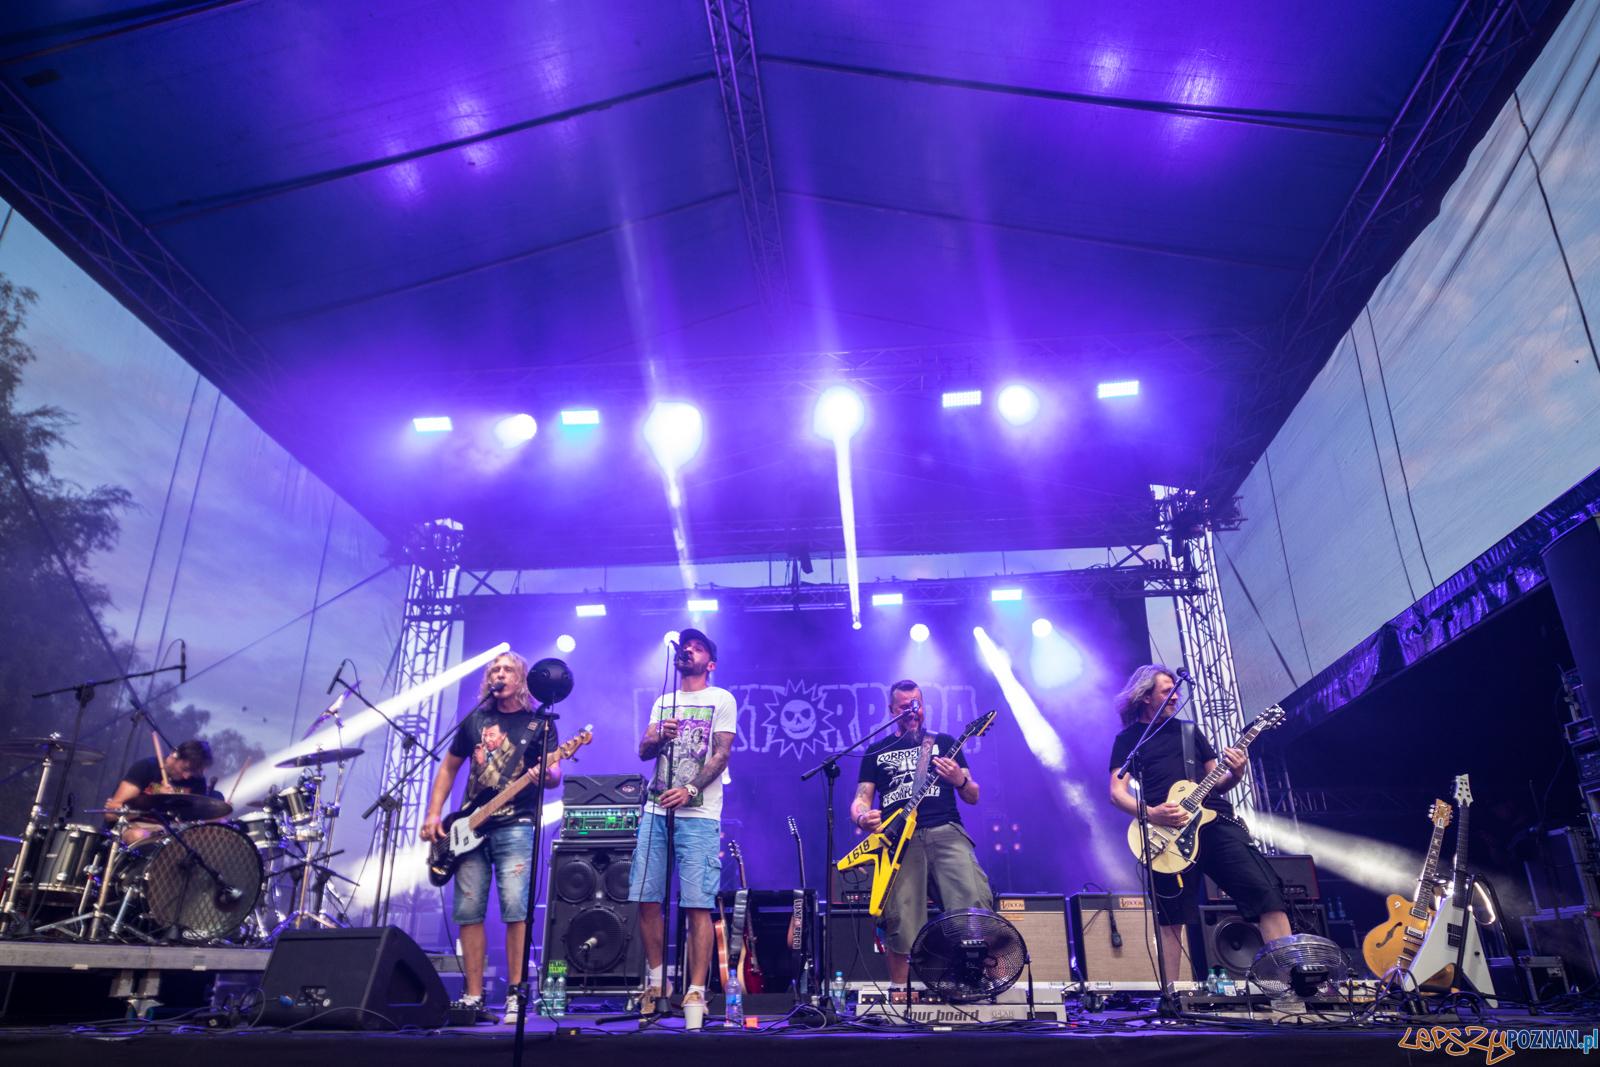 #NaFalach - Luxfest - Luxtorpeda  Foto: lepszyPOZNAN.pl/Piotr Rychter